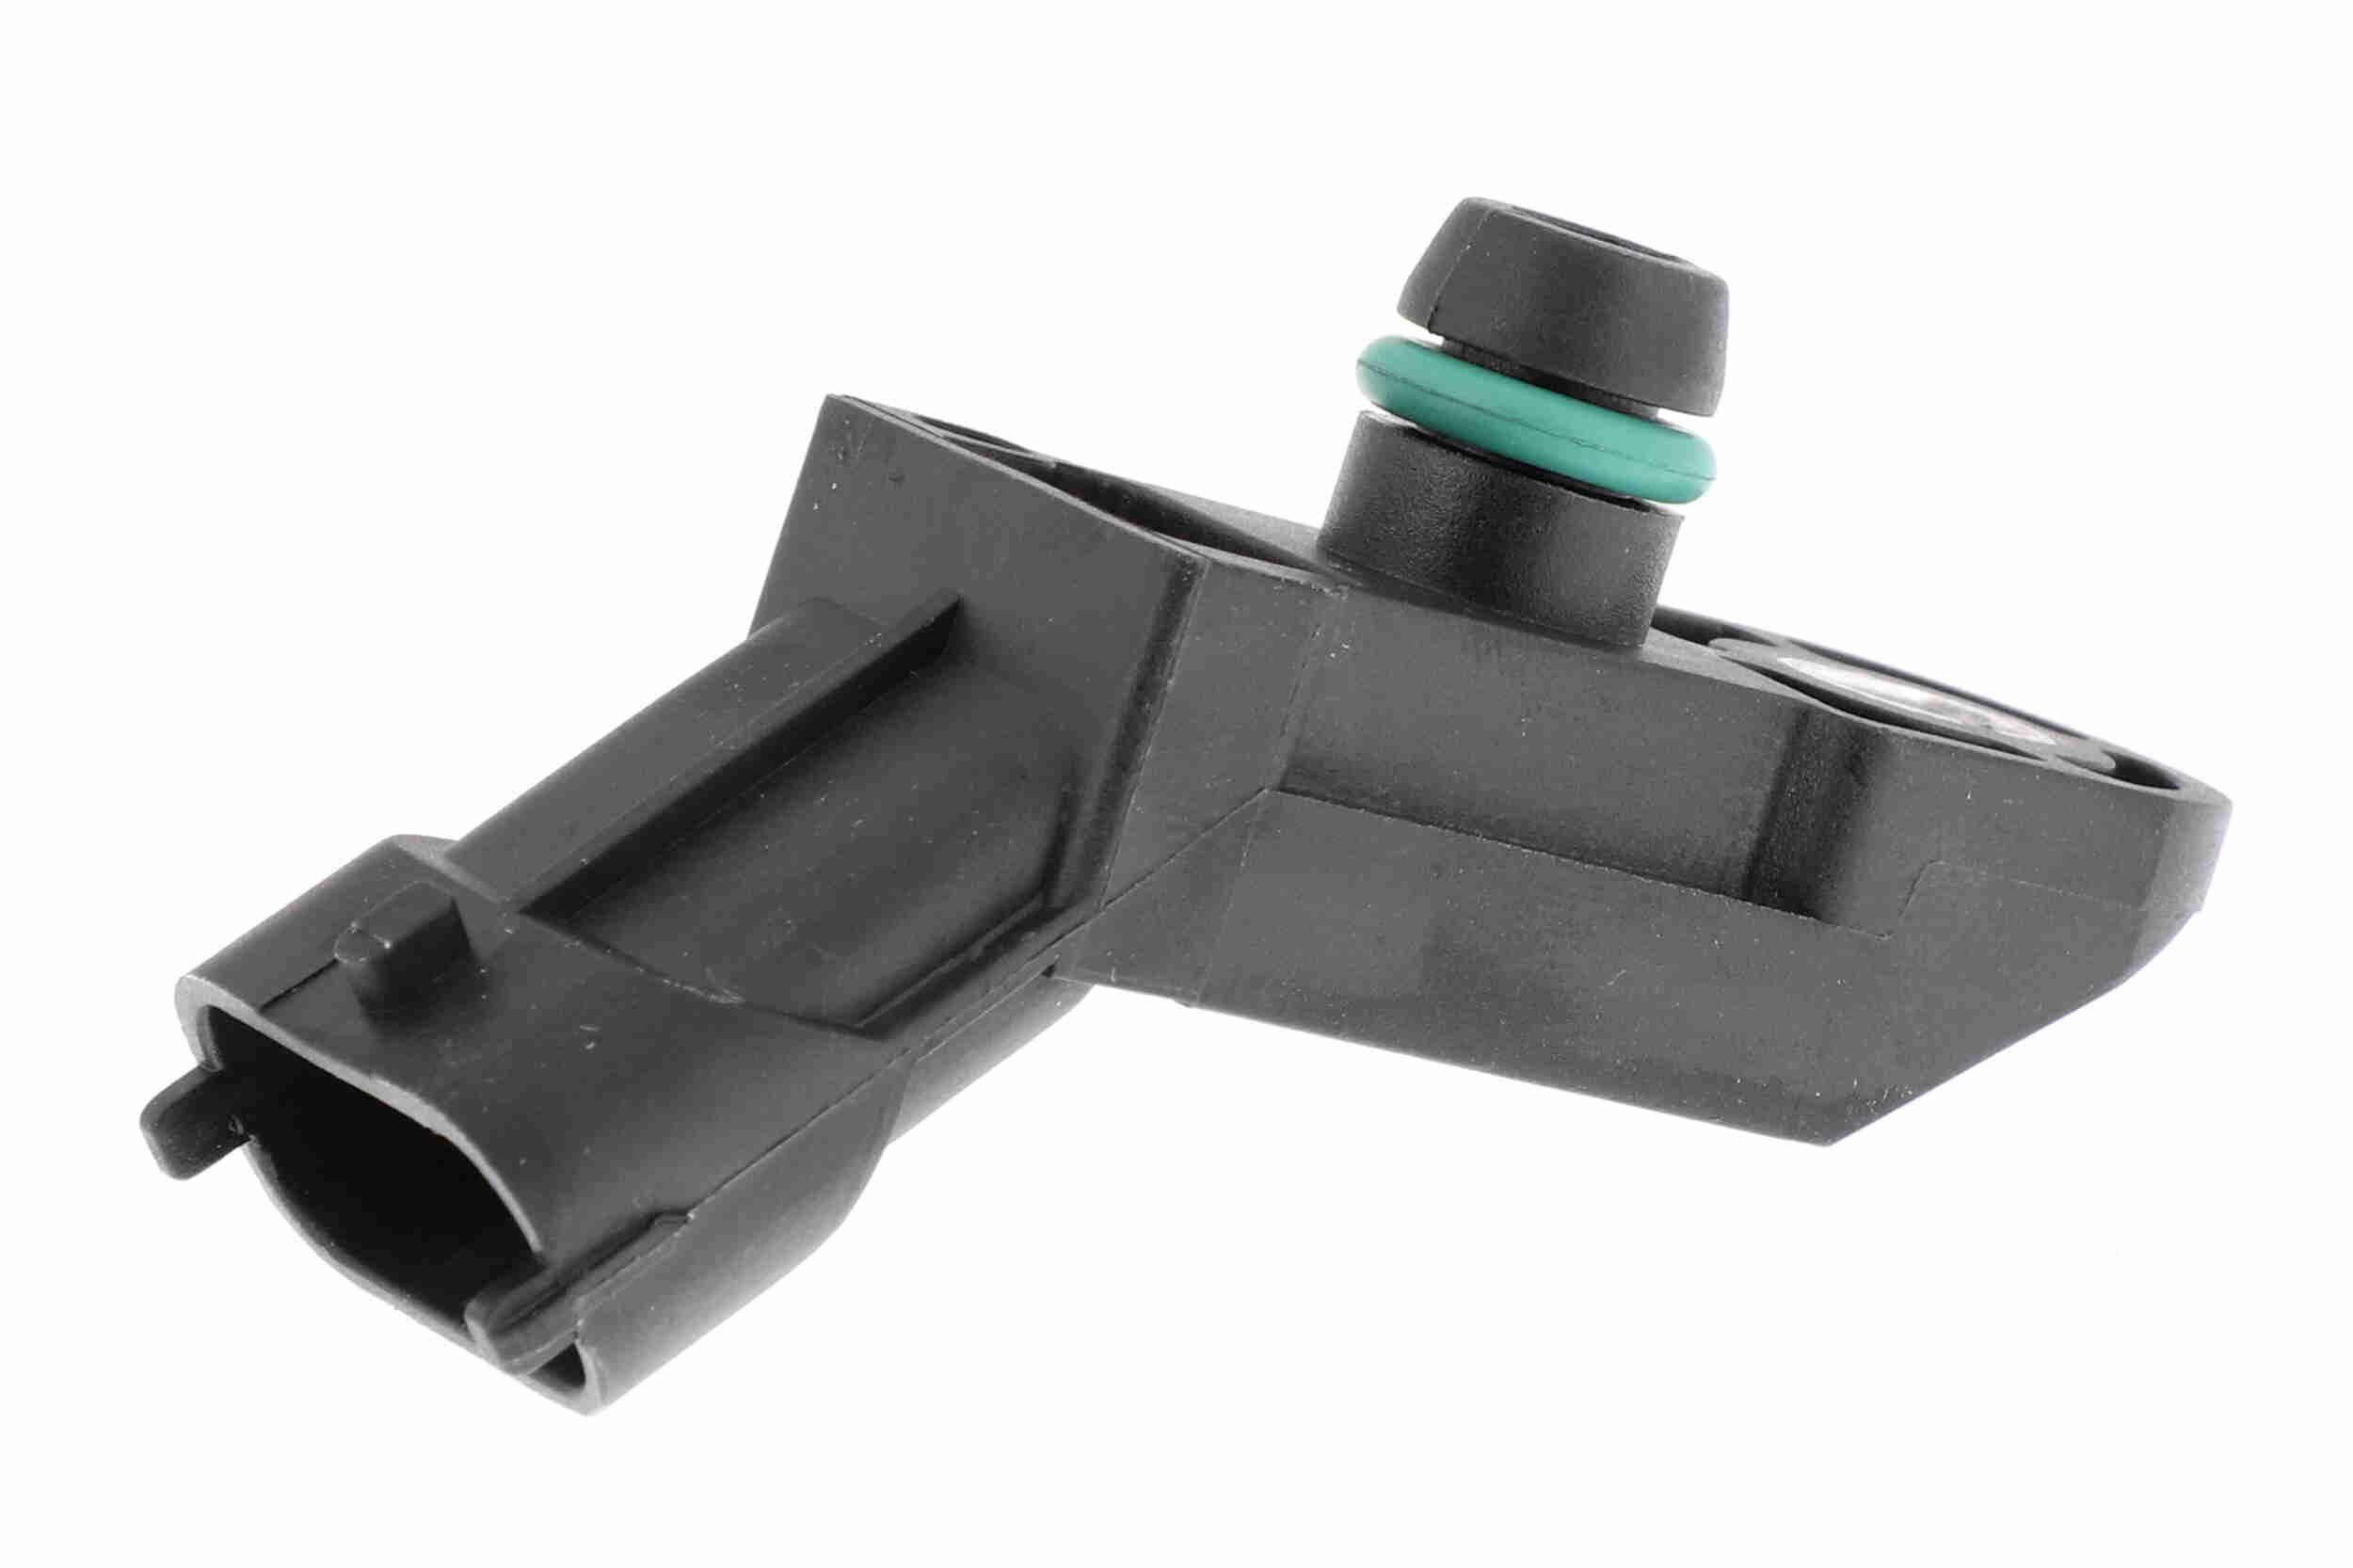 NISSAN PRAIRIE Ladedrucksensor - Original VEMO V40-72-0416-1 Pol-Anzahl: 3-polig